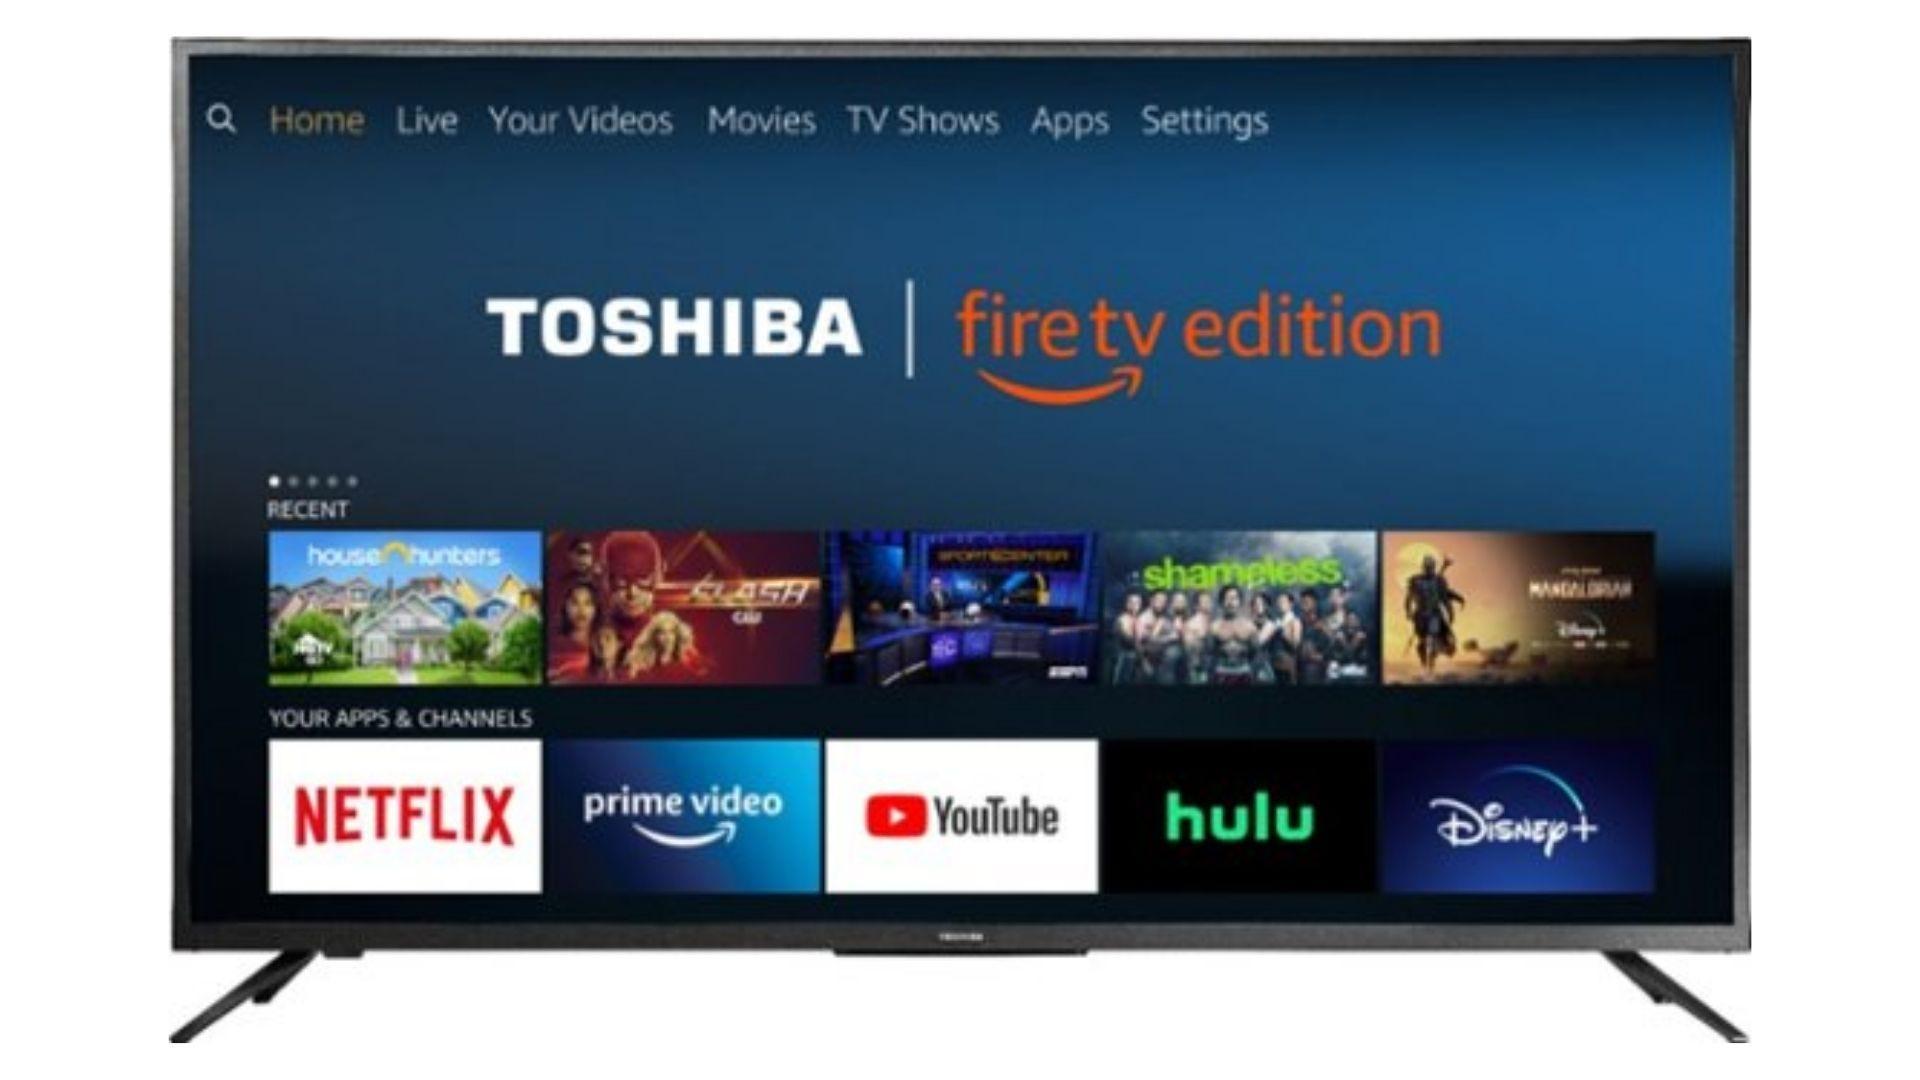 Toshiba 55 Class LED 4K UHD Smart Fire TV Edition TV